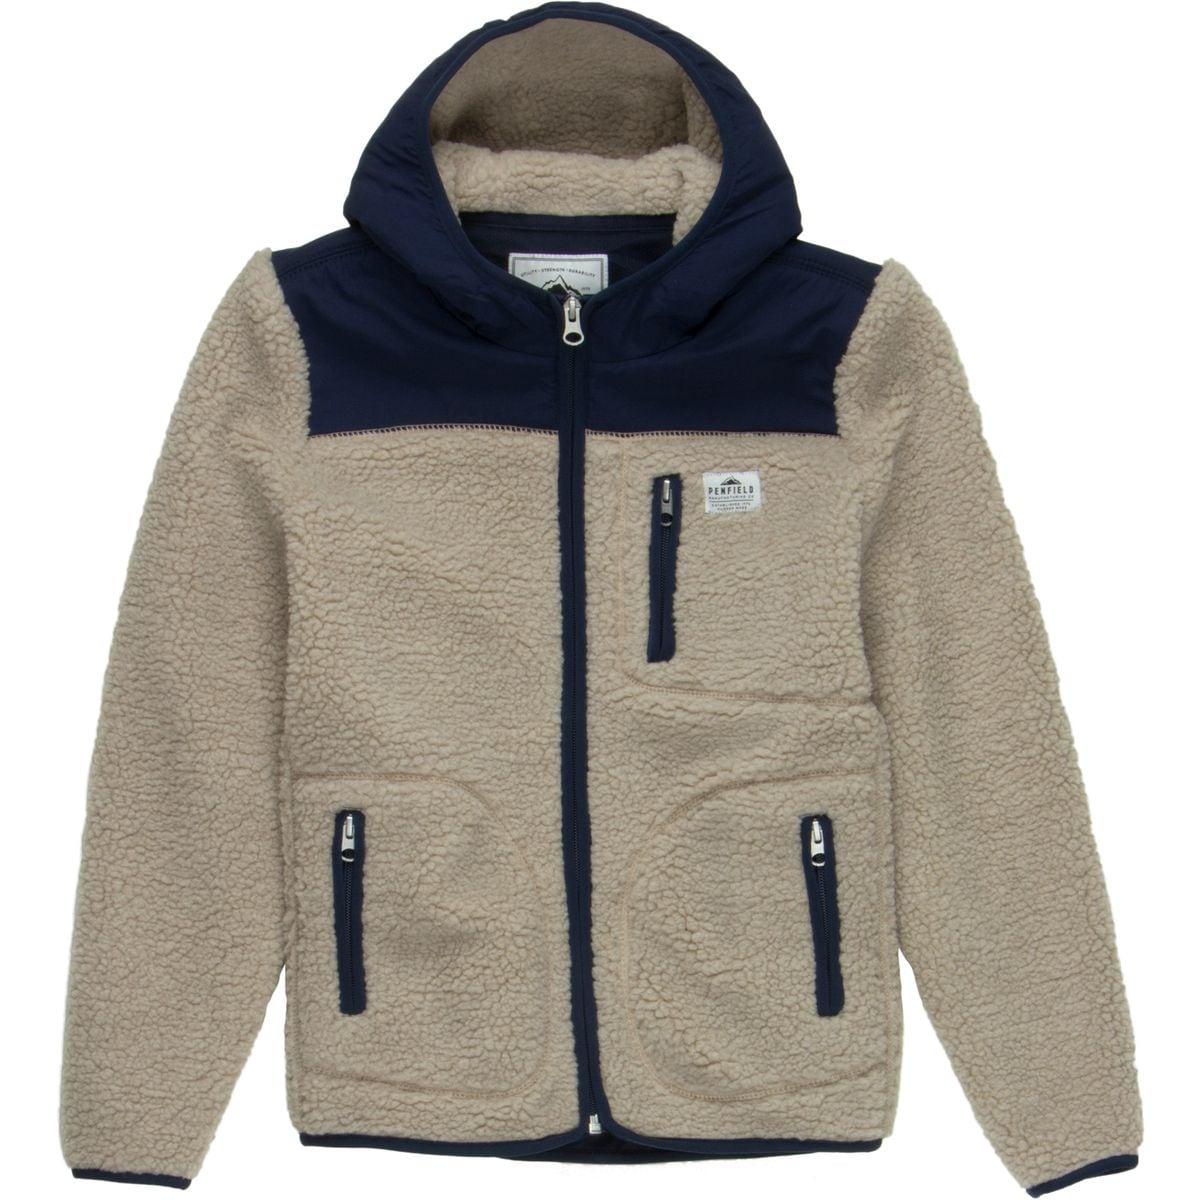 Penfield Carson Hooded Pile Fleece Jacket - Boys